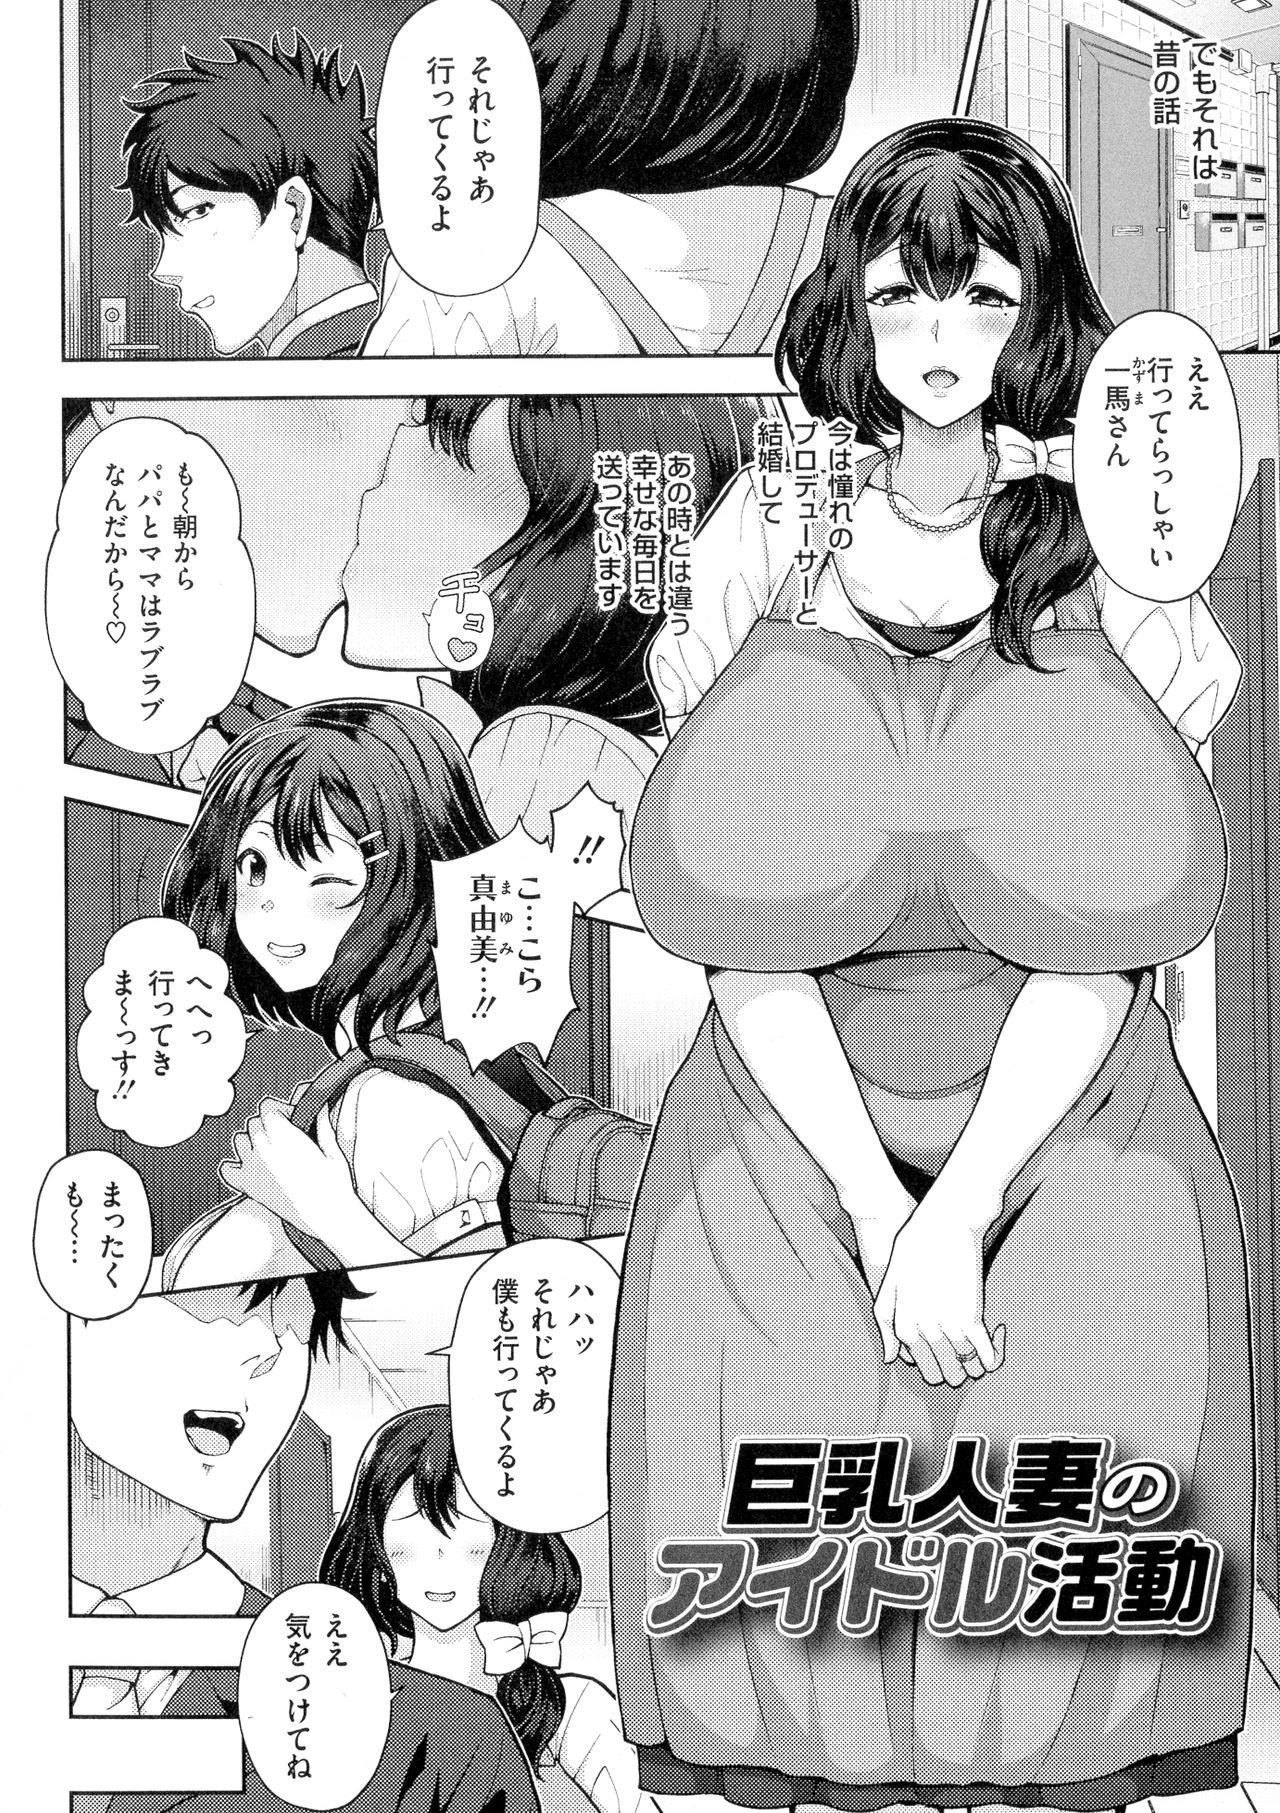 Juku Mesu - Erotic Mature Women 104